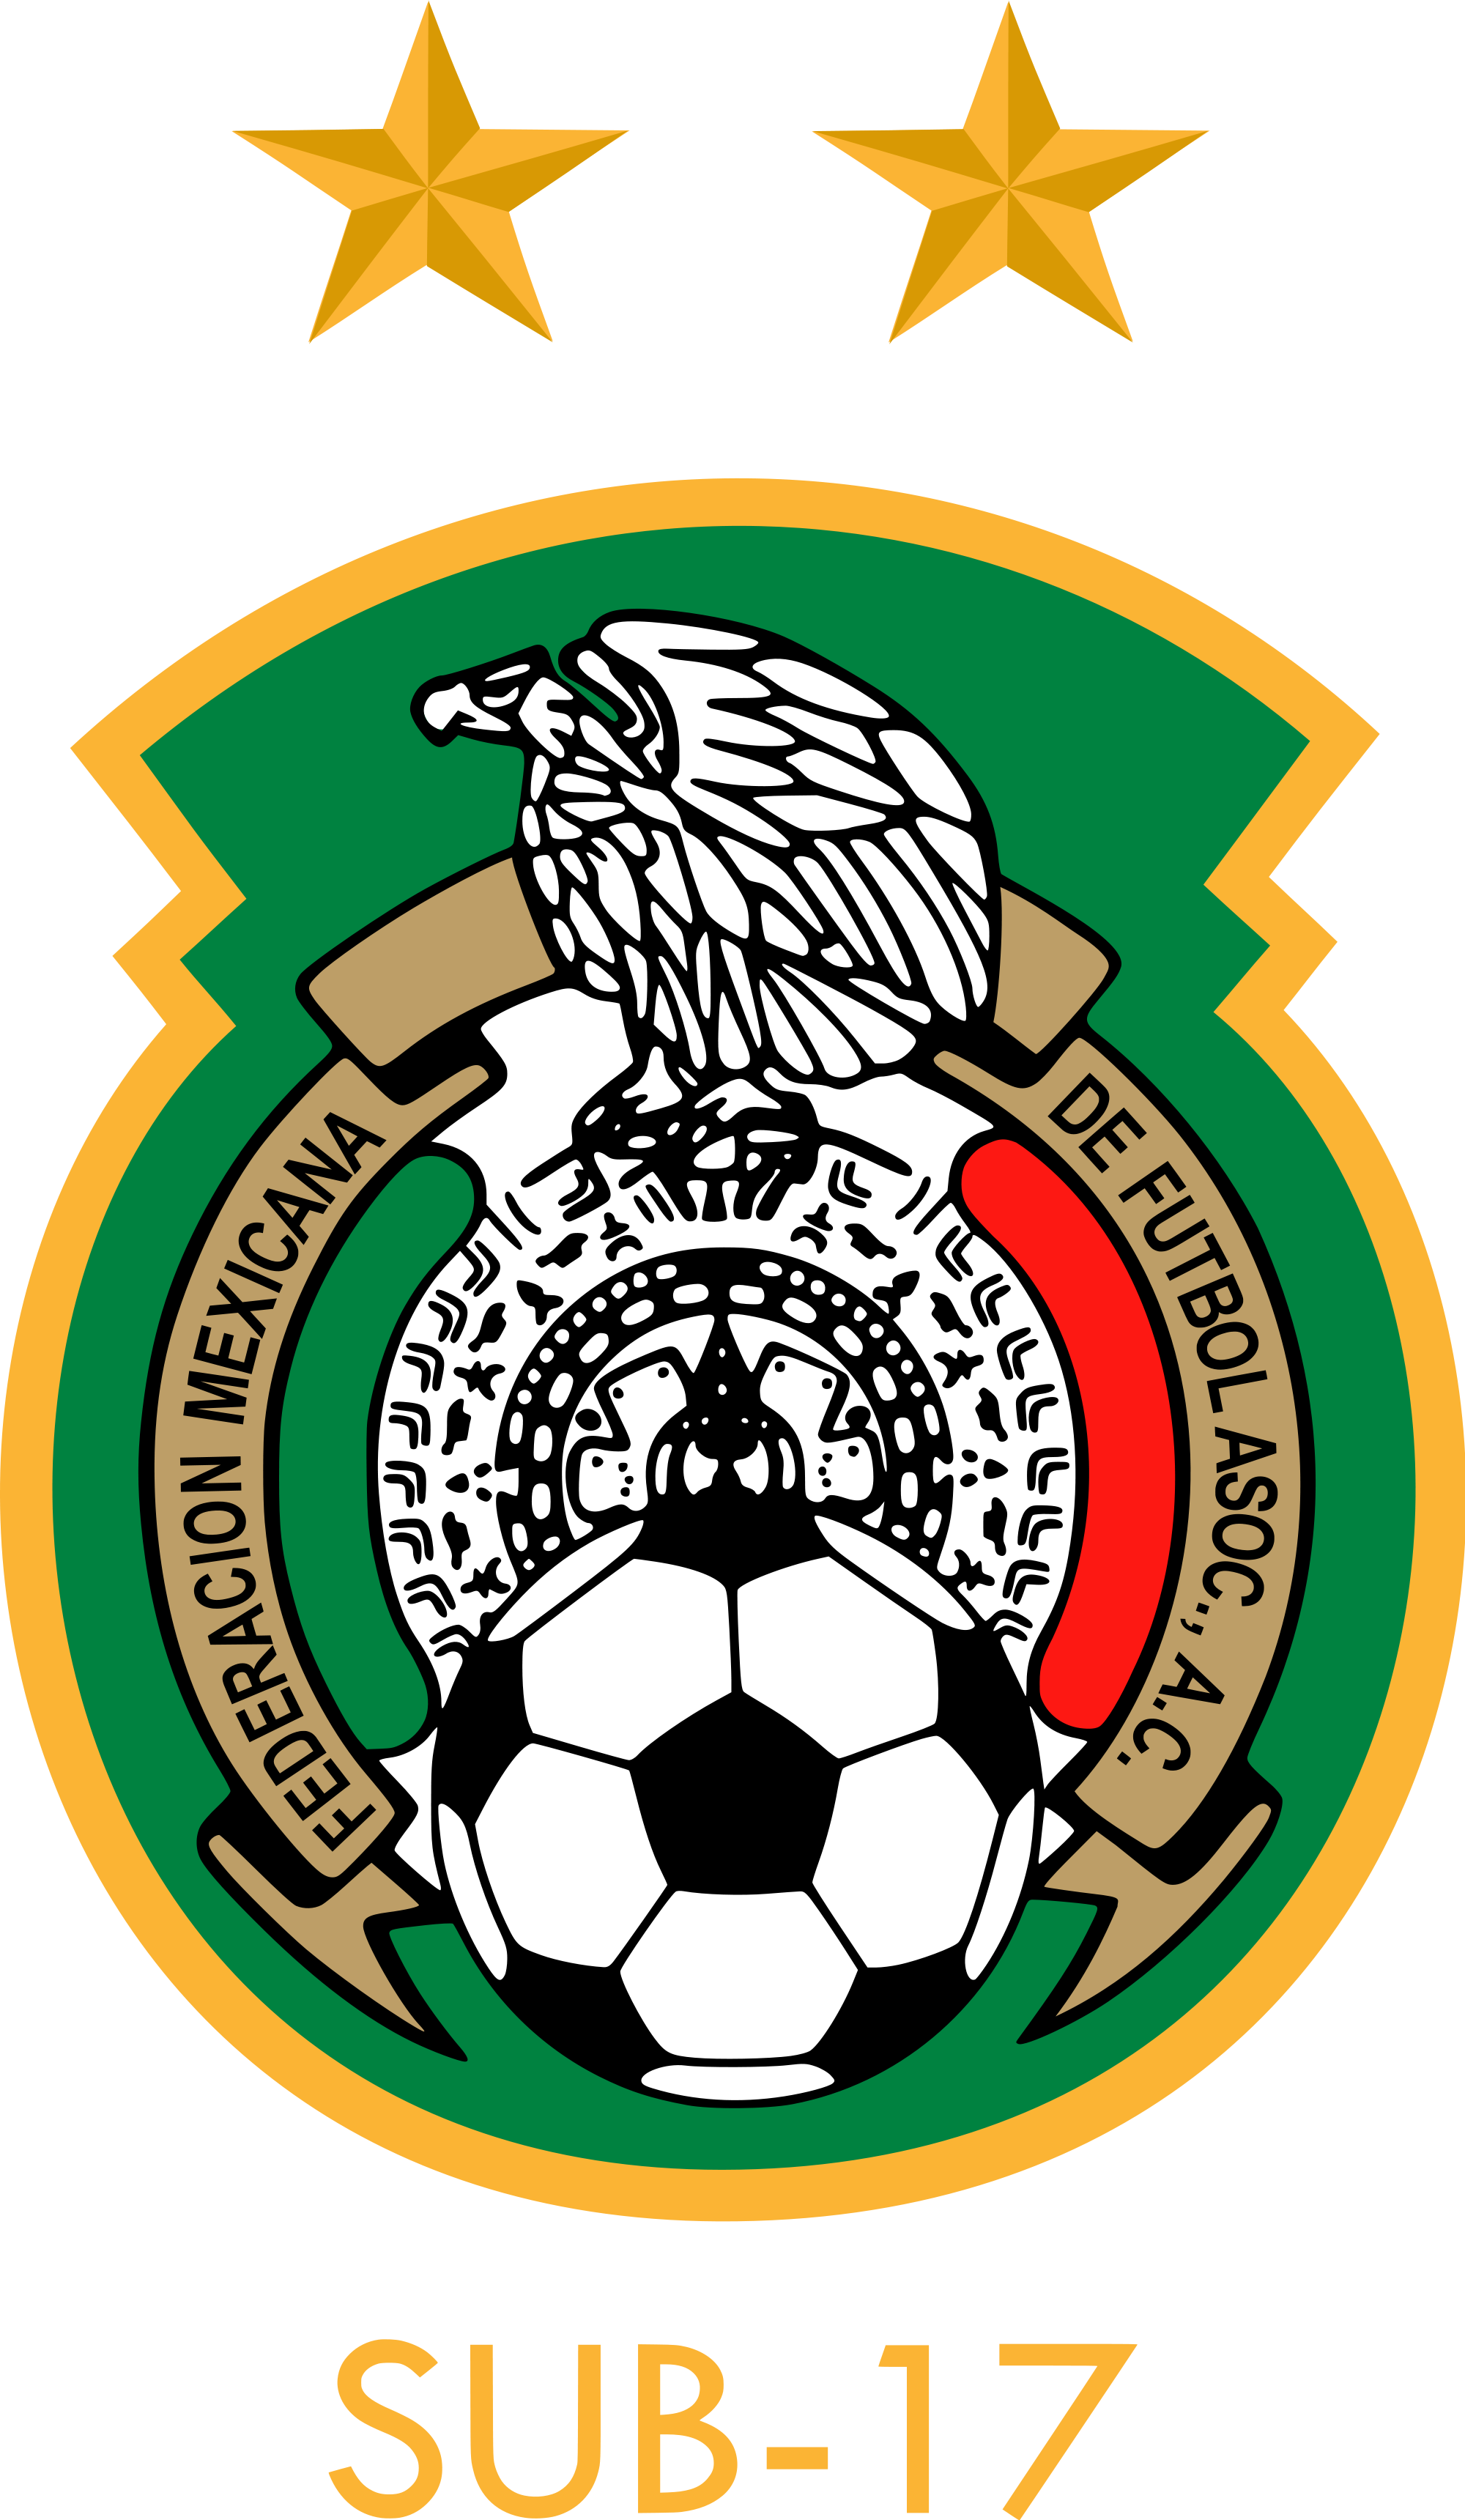 Mexico National Football Team U17 Wallpaper, Escudos de